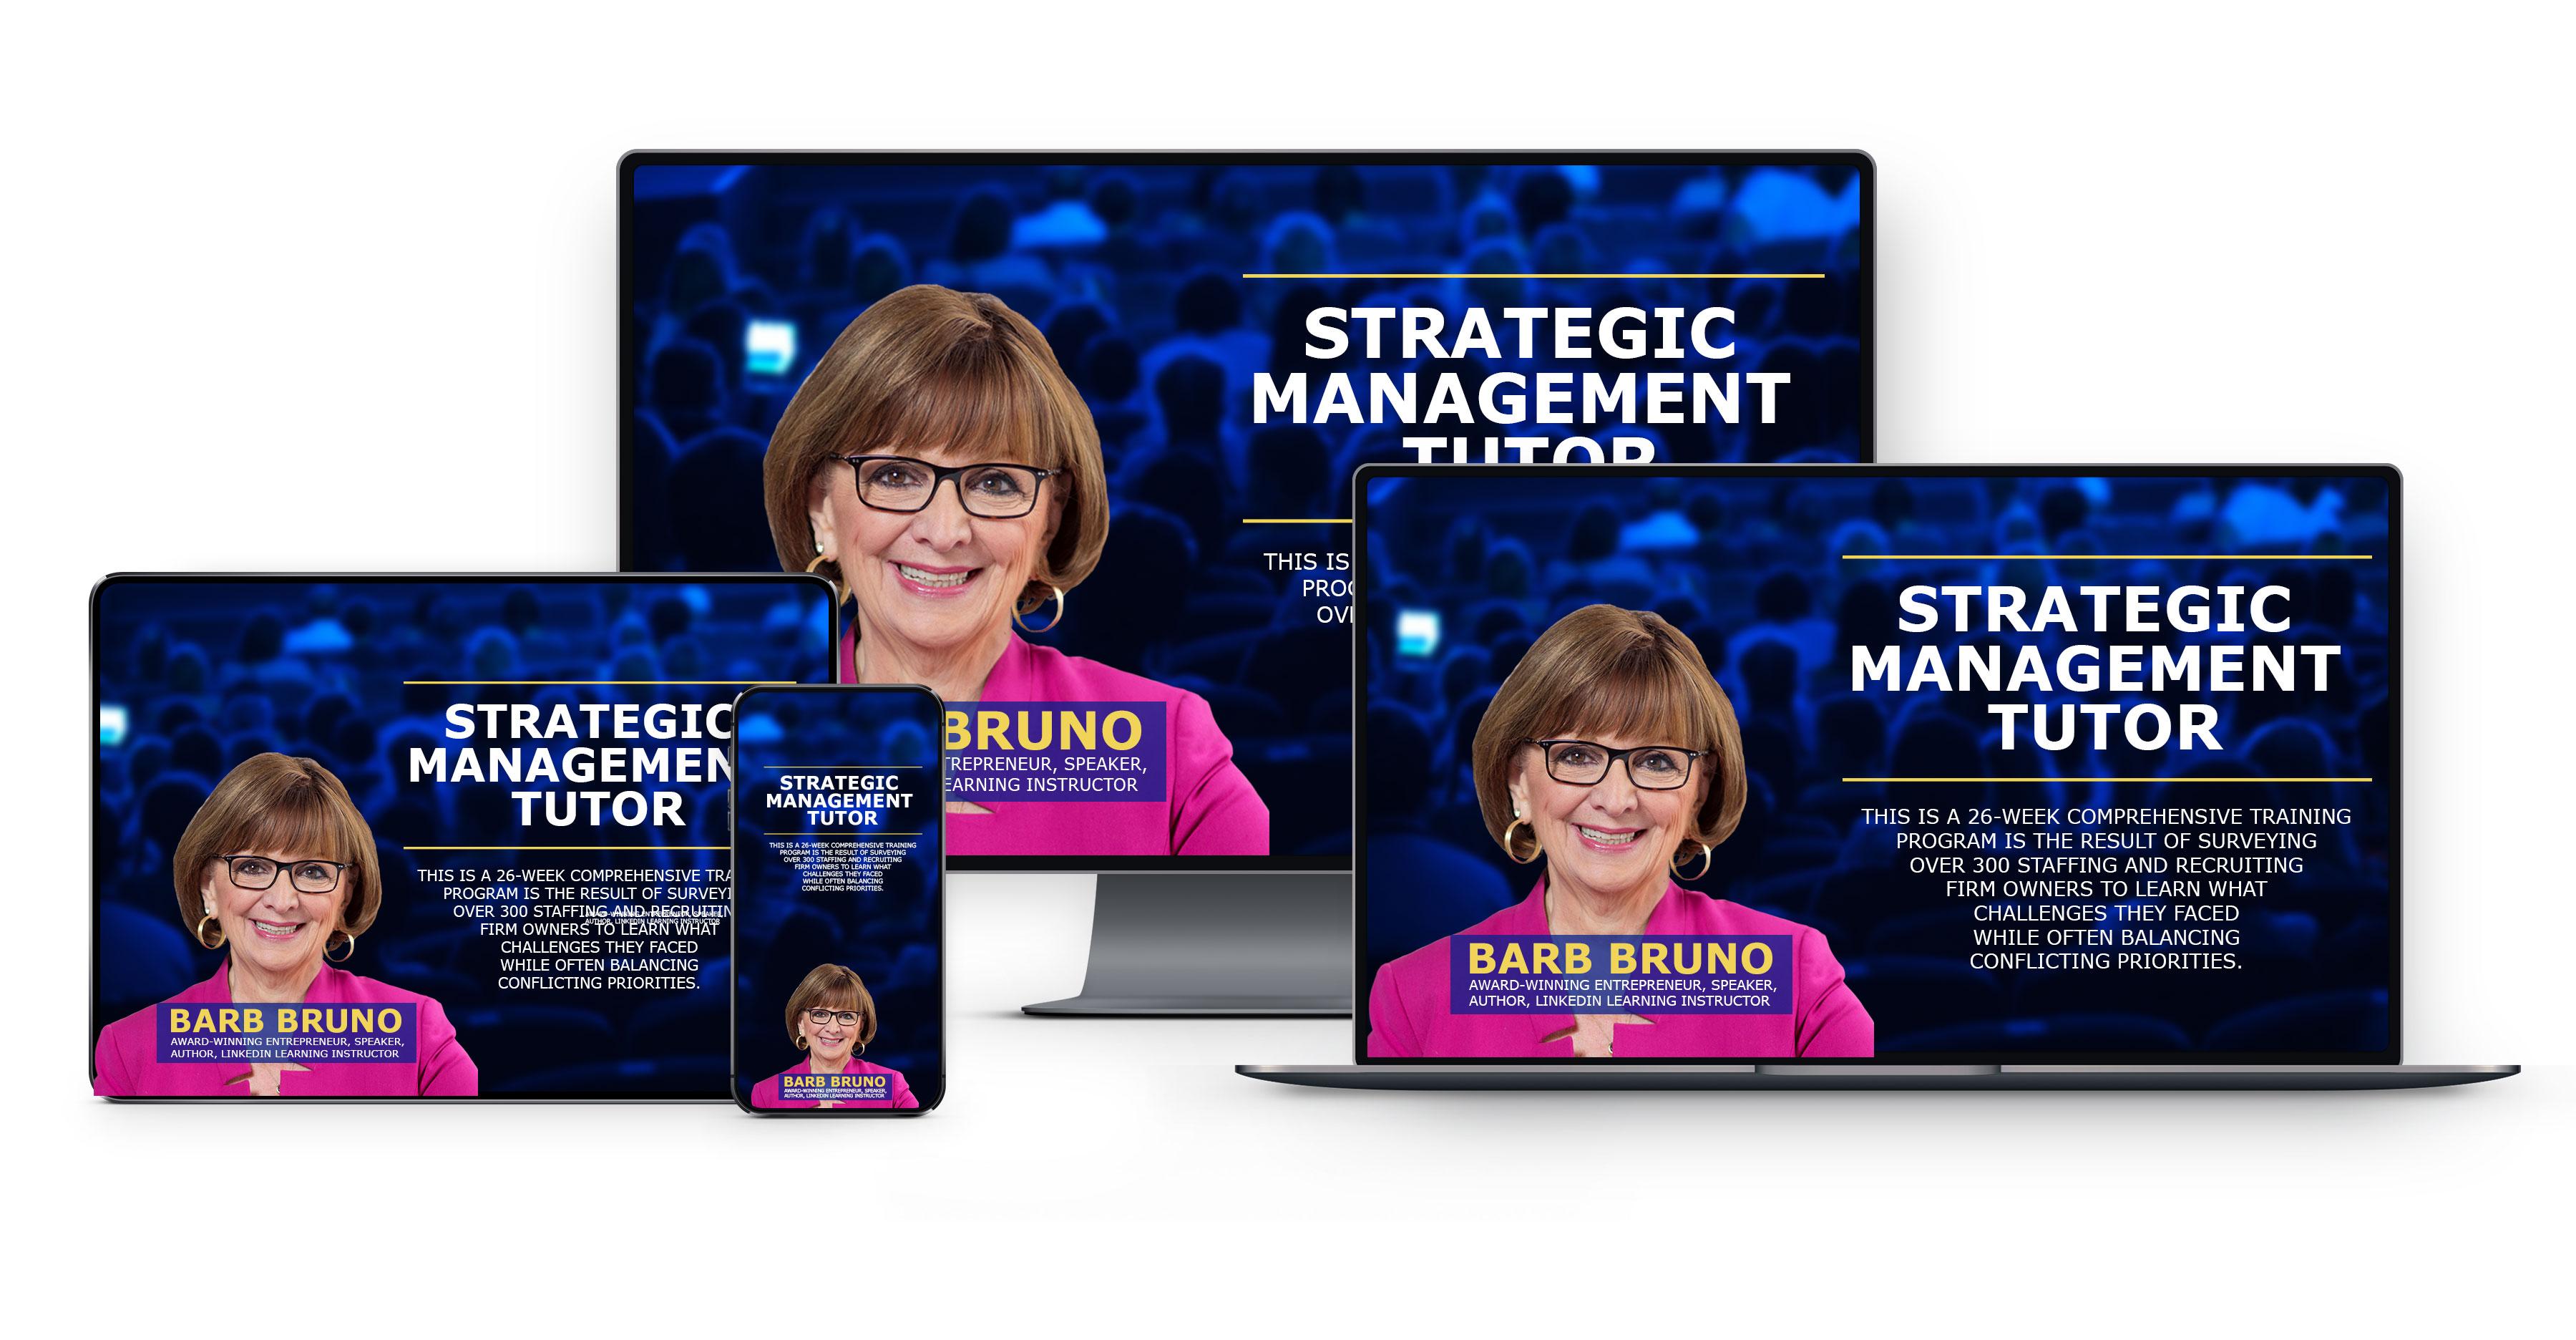 strategic-management-tutor